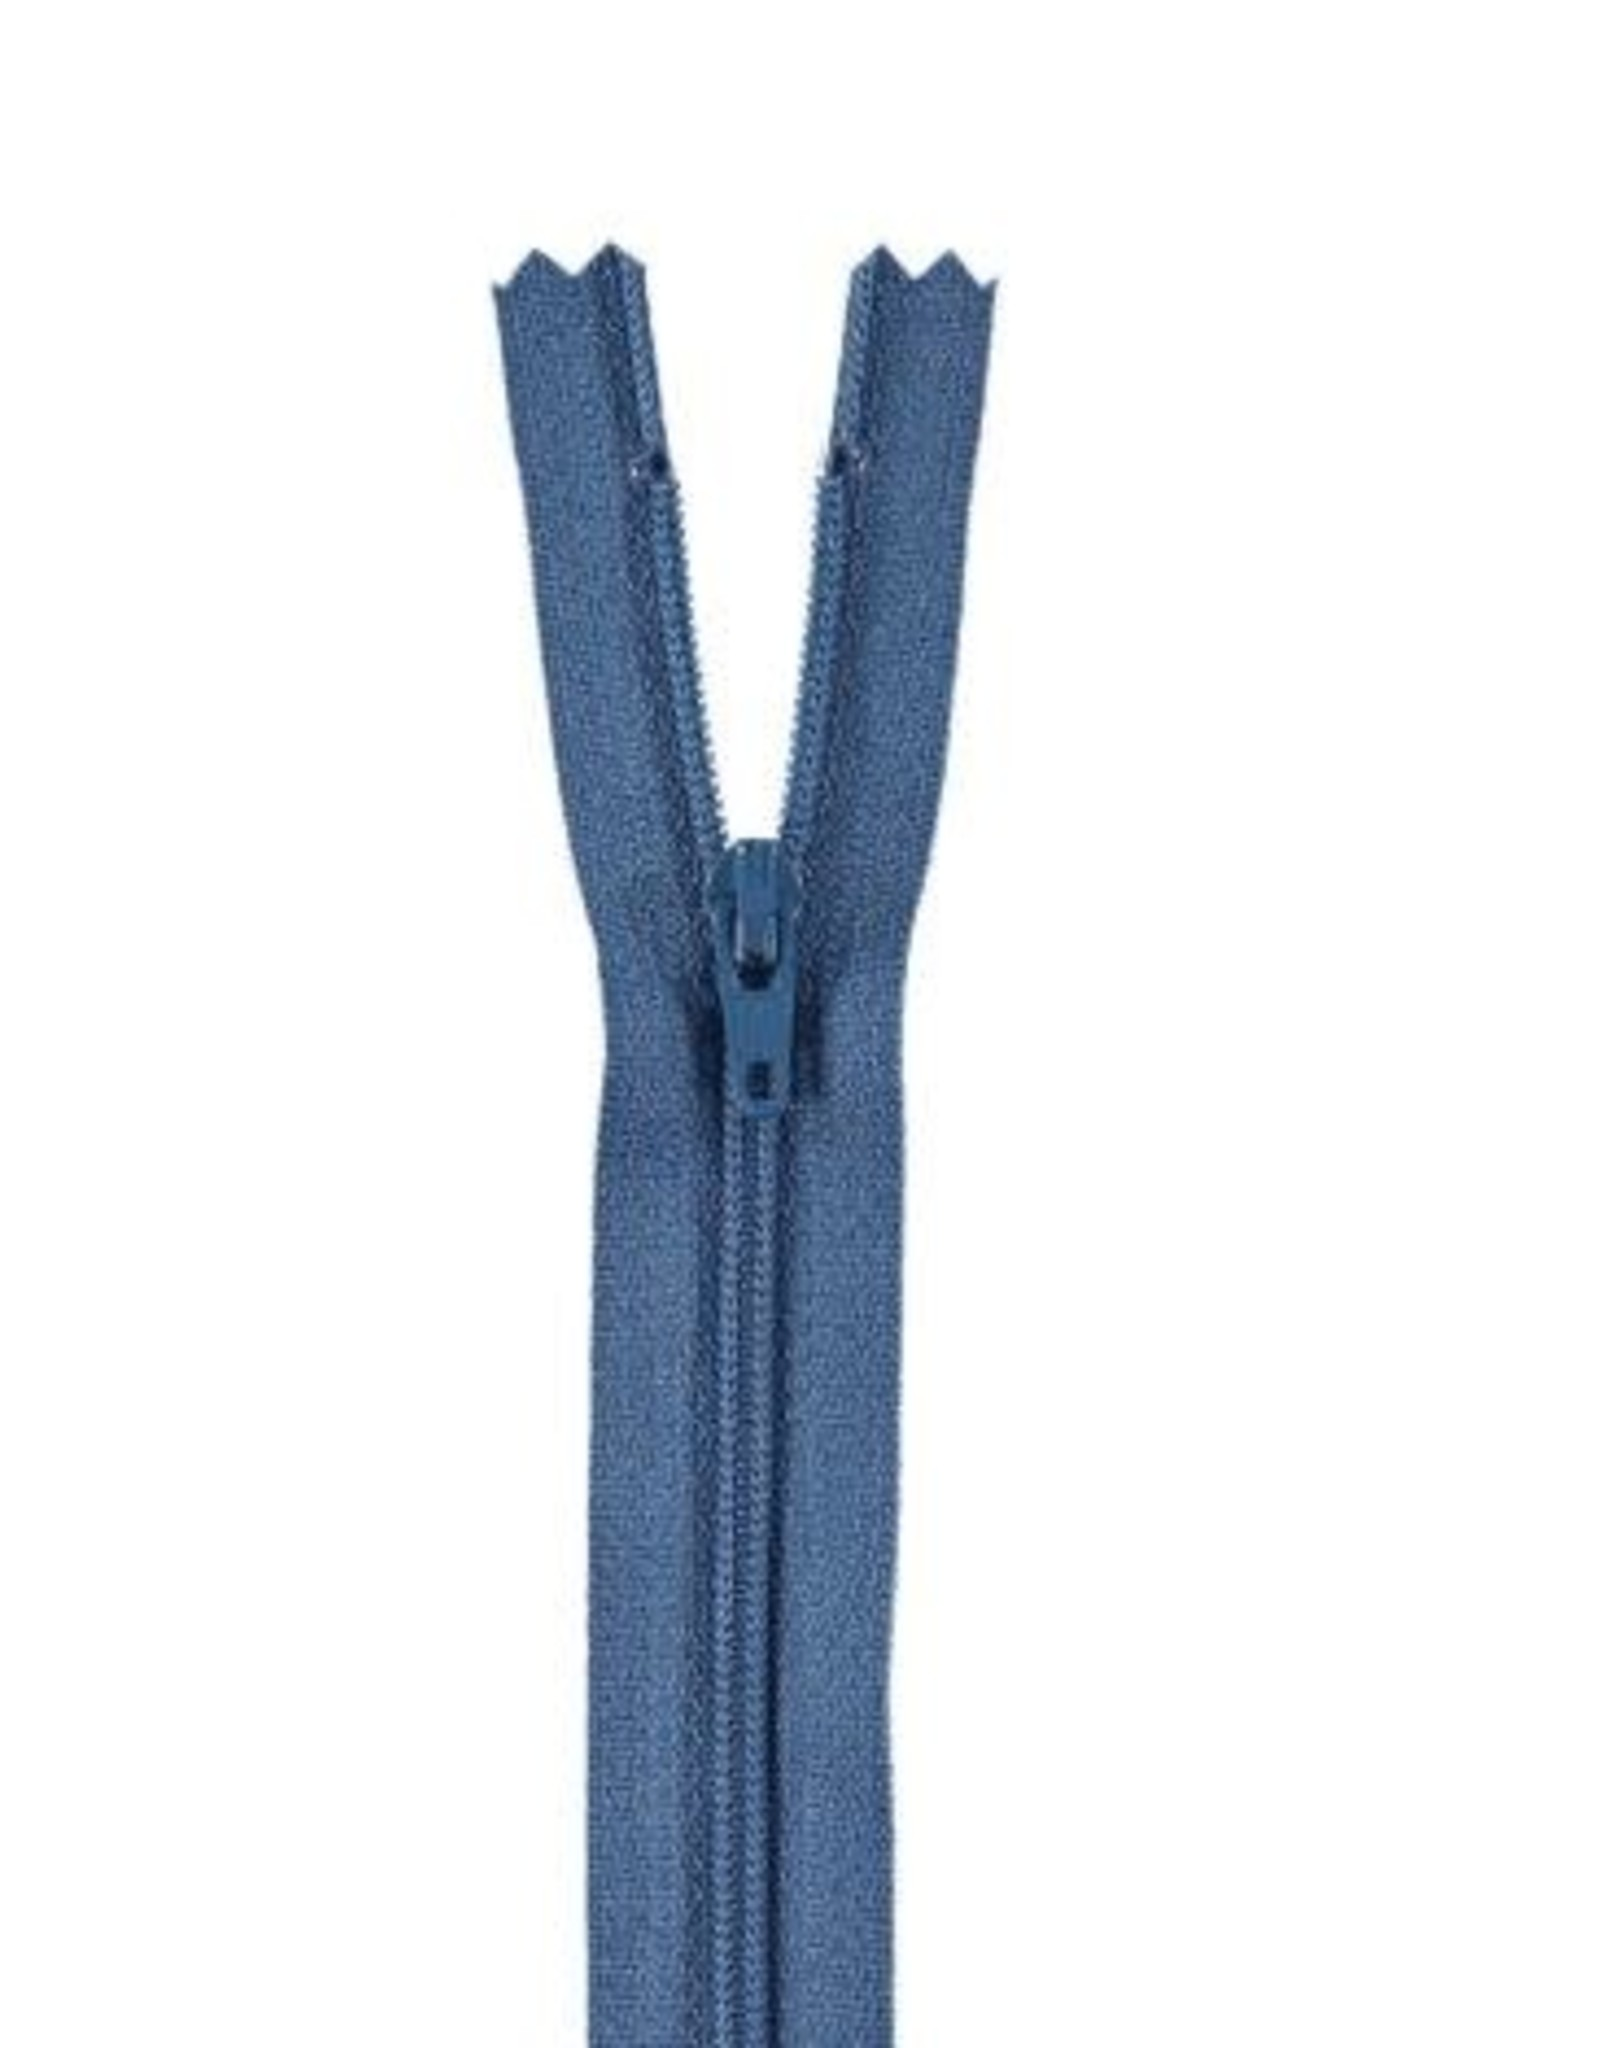 YKK Spiraalrits niet-DB 3mm jeansblauw 839-50cm